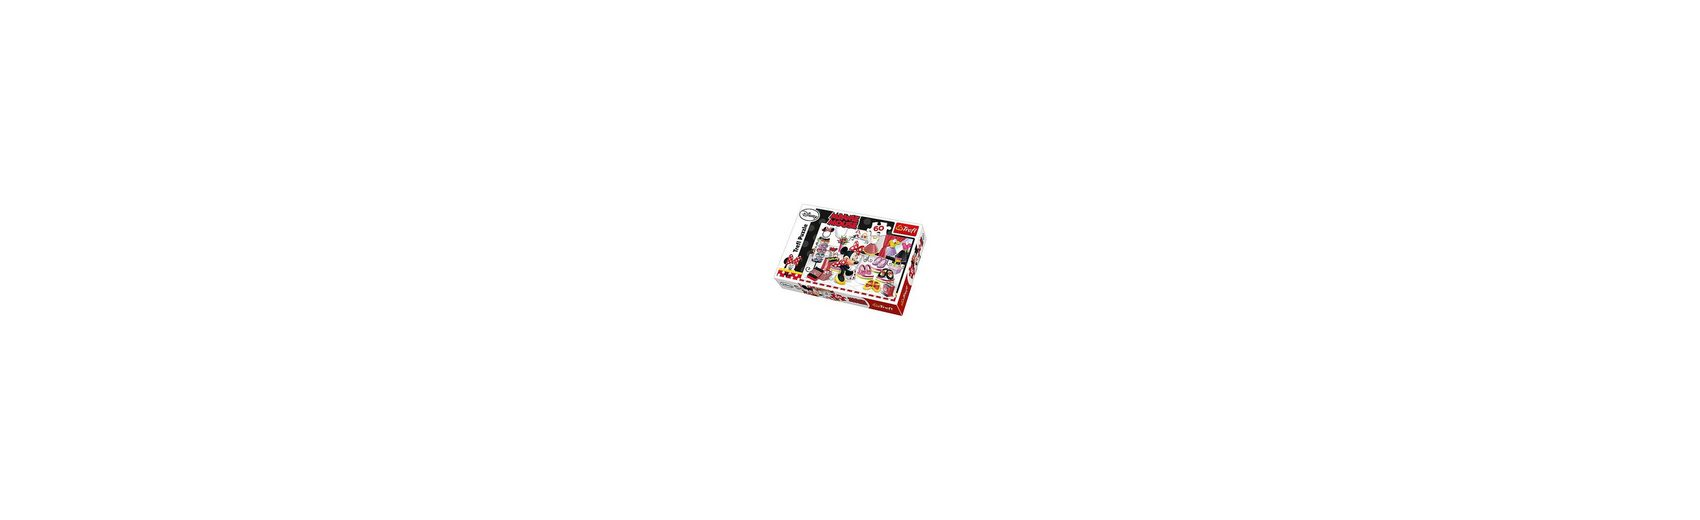 Trefl Puzzle 60 Teile - Minnie Maus